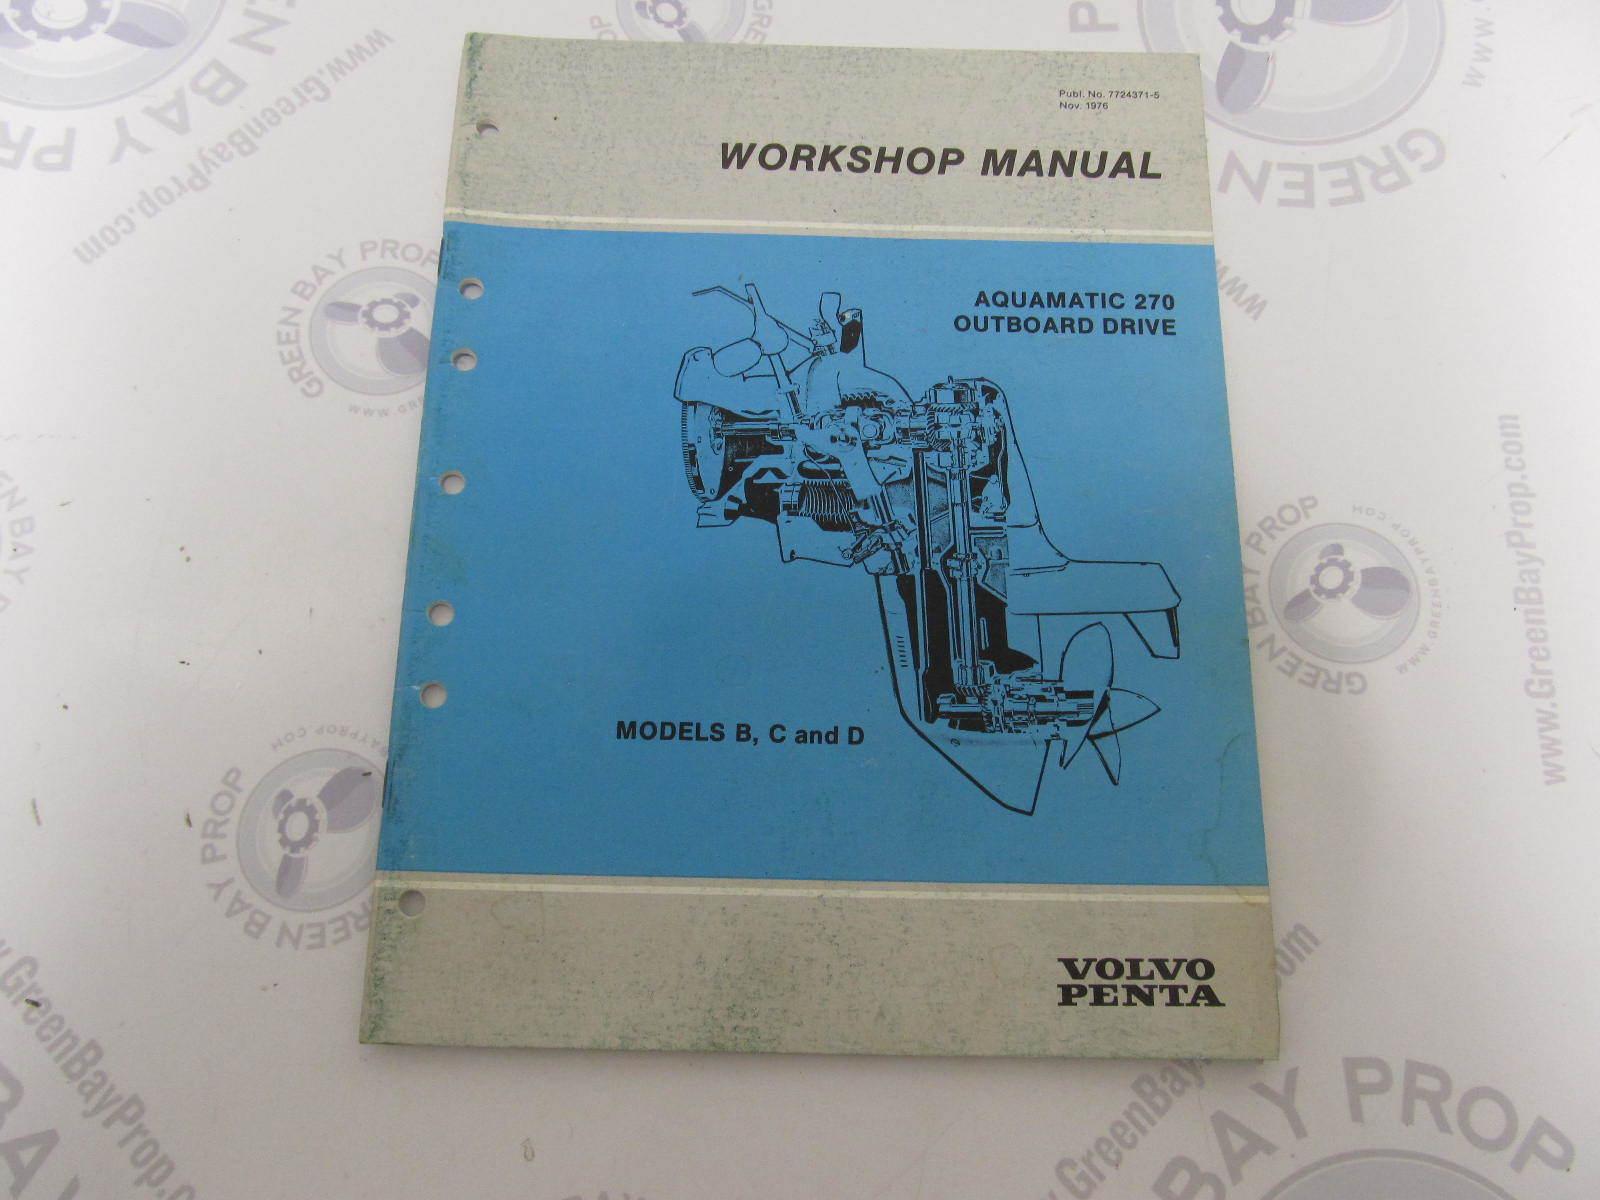 7724371 5 volvo penta aquamatic service workshop manual 270 outboard rh greenbayprop com volvo penta 270 outdrive service manual Volvo Penta 270 Diagram